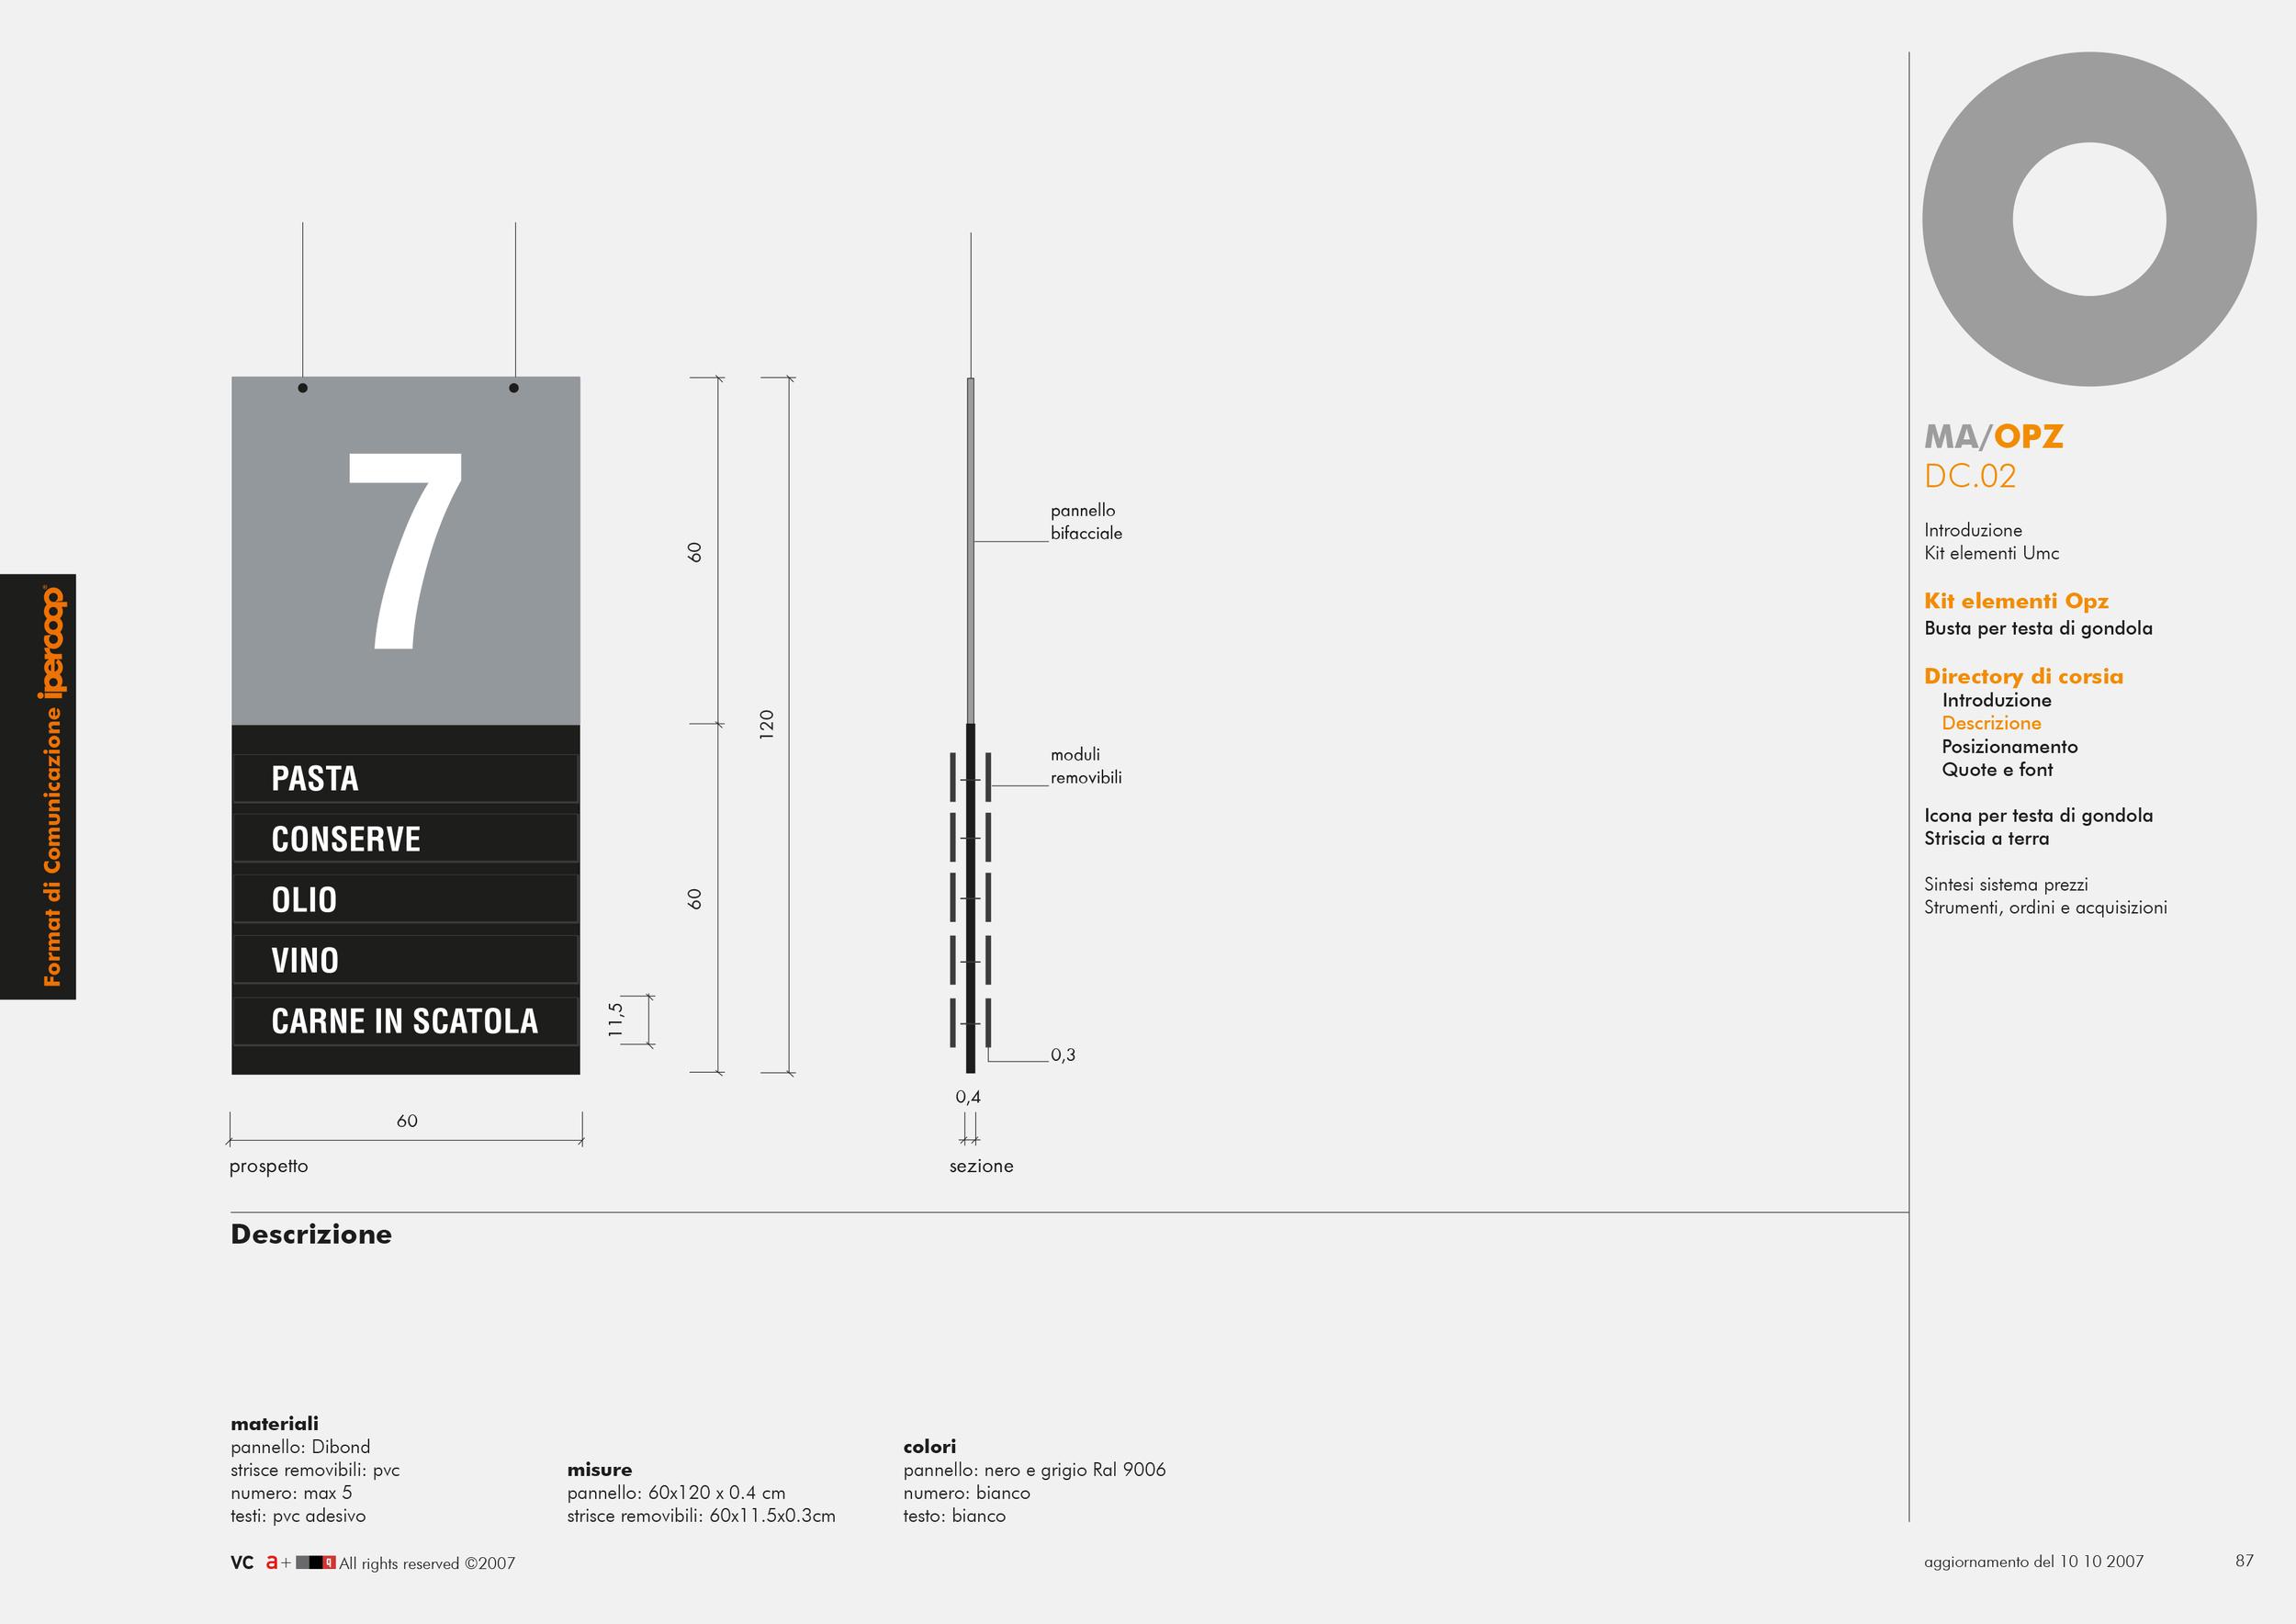 manuale-ALLESTIMENTO-19.jpg